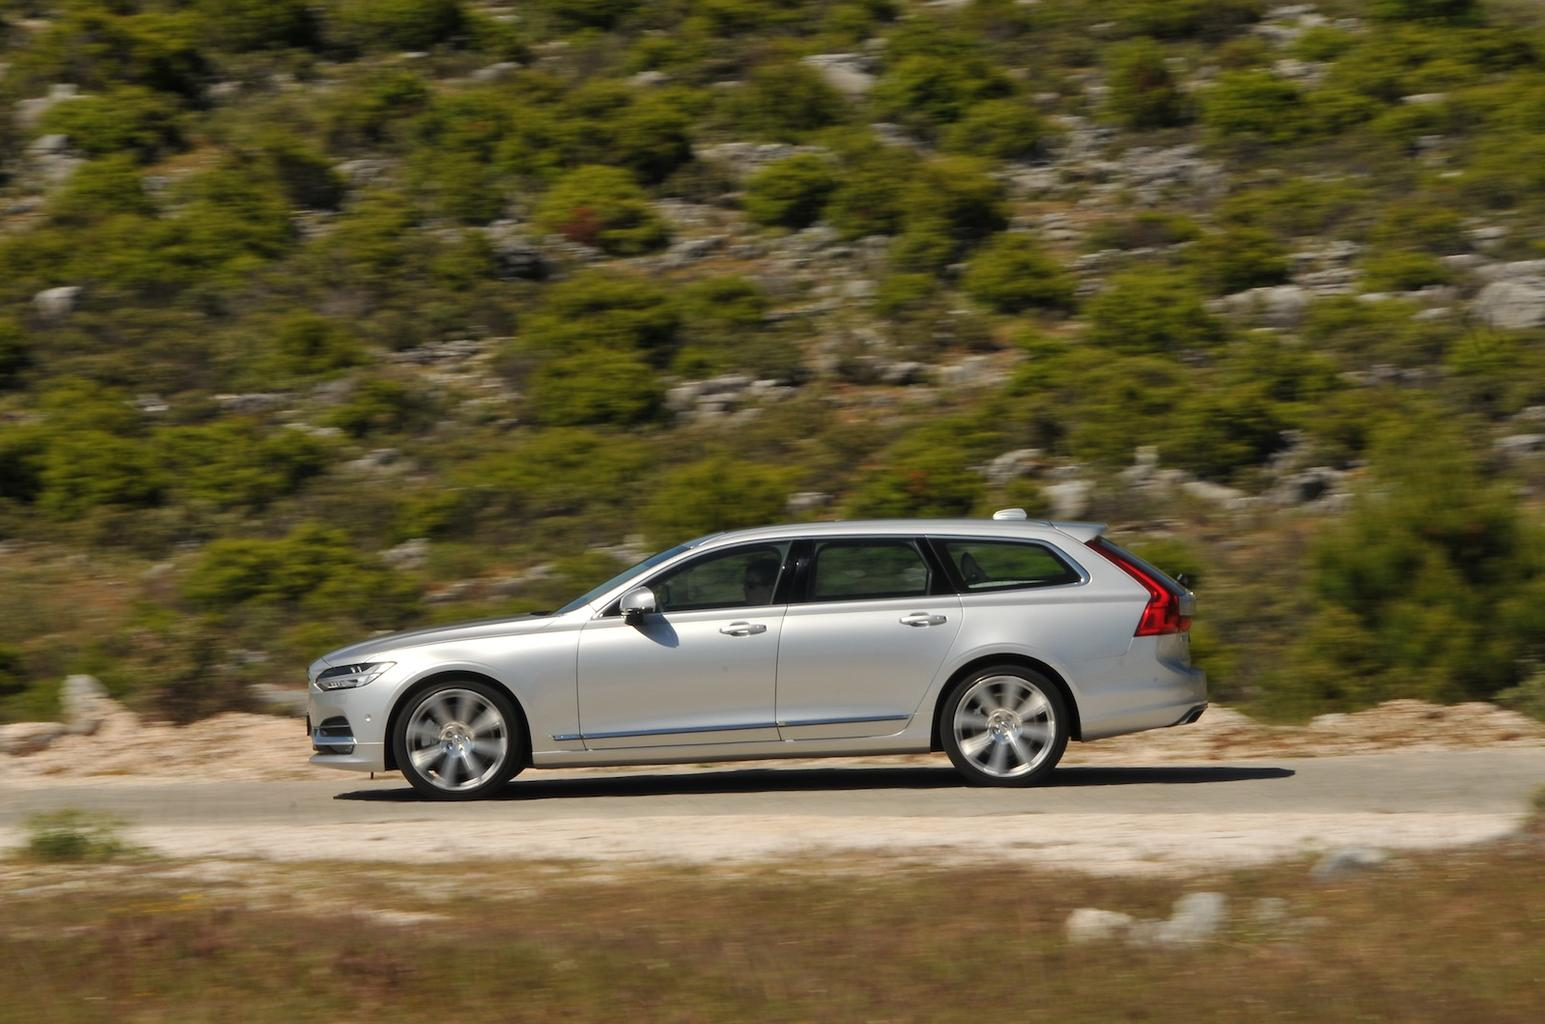 2016 Volvo V90 D5 review